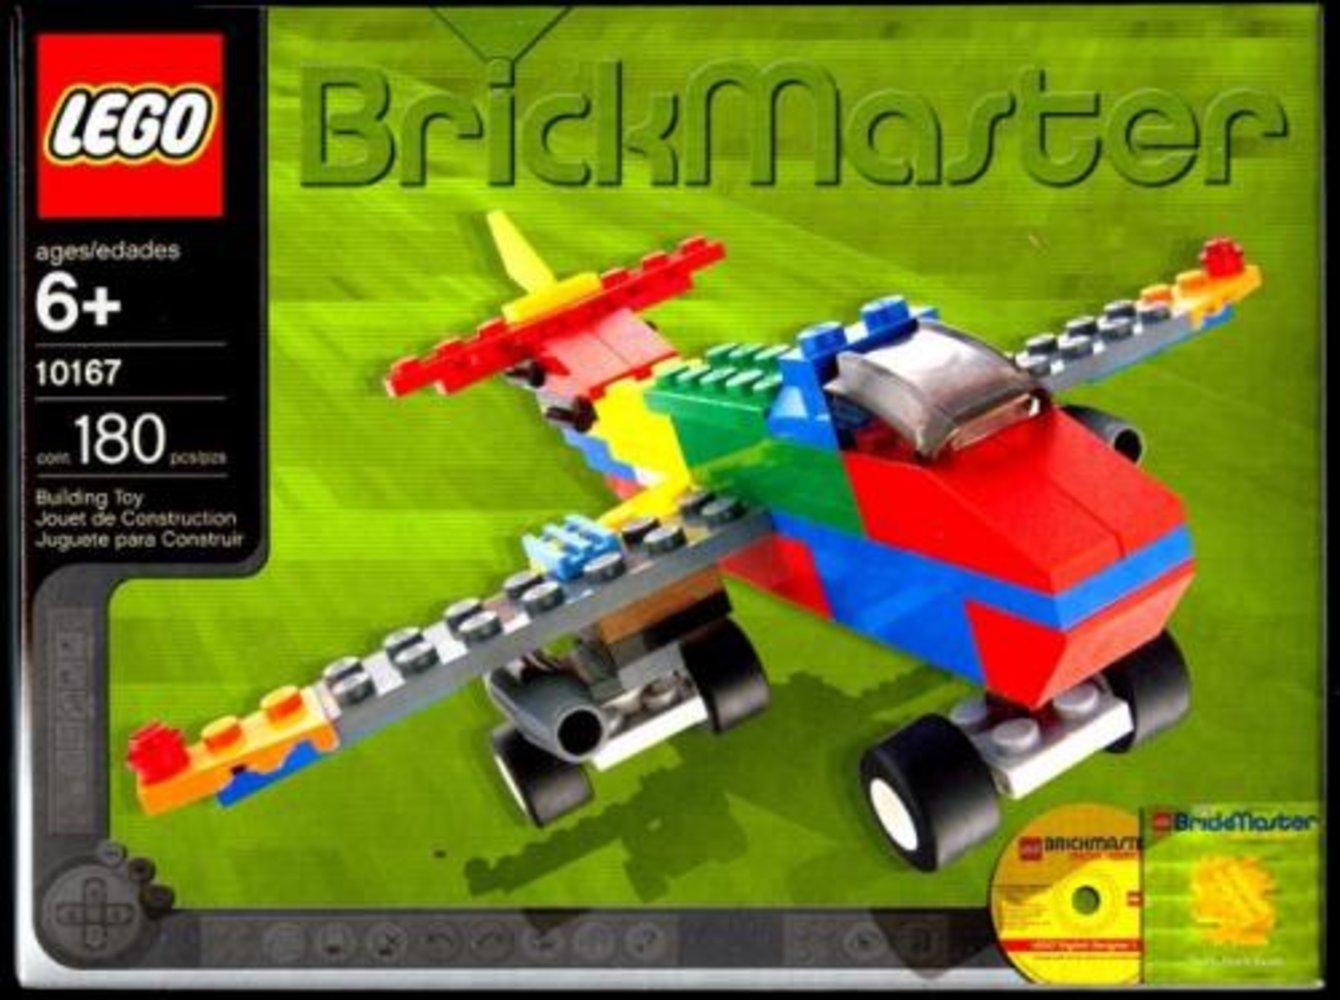 Brickmaster Kit (with Digital Designer CD)